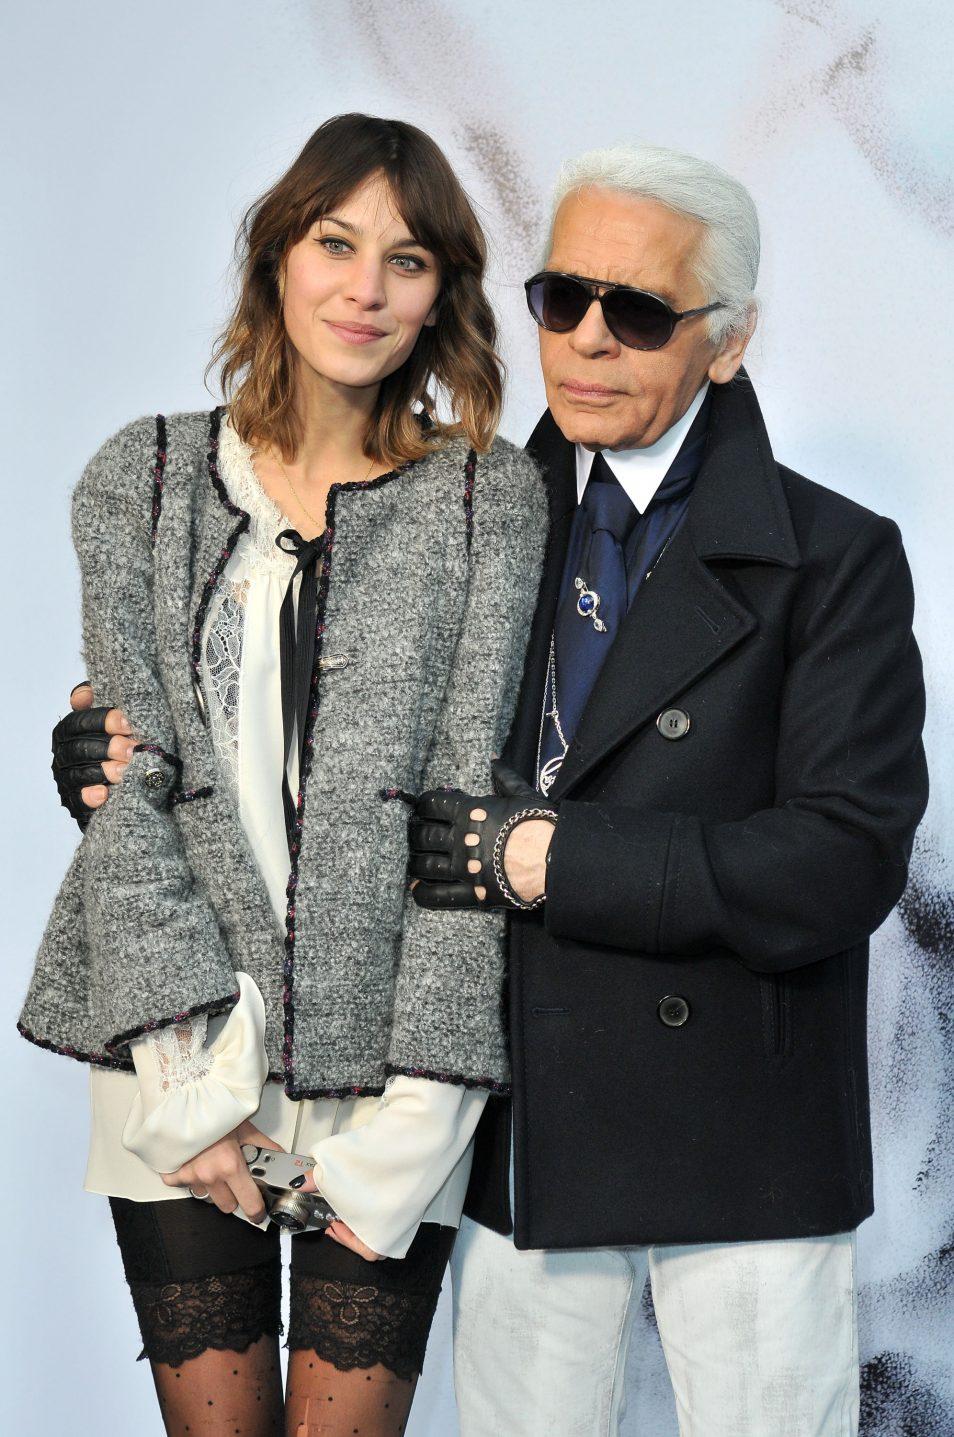 Chanel Ready To Wear - Fall/Winter 2011 - Photocall Alexa Chung Karl Lagerfeld